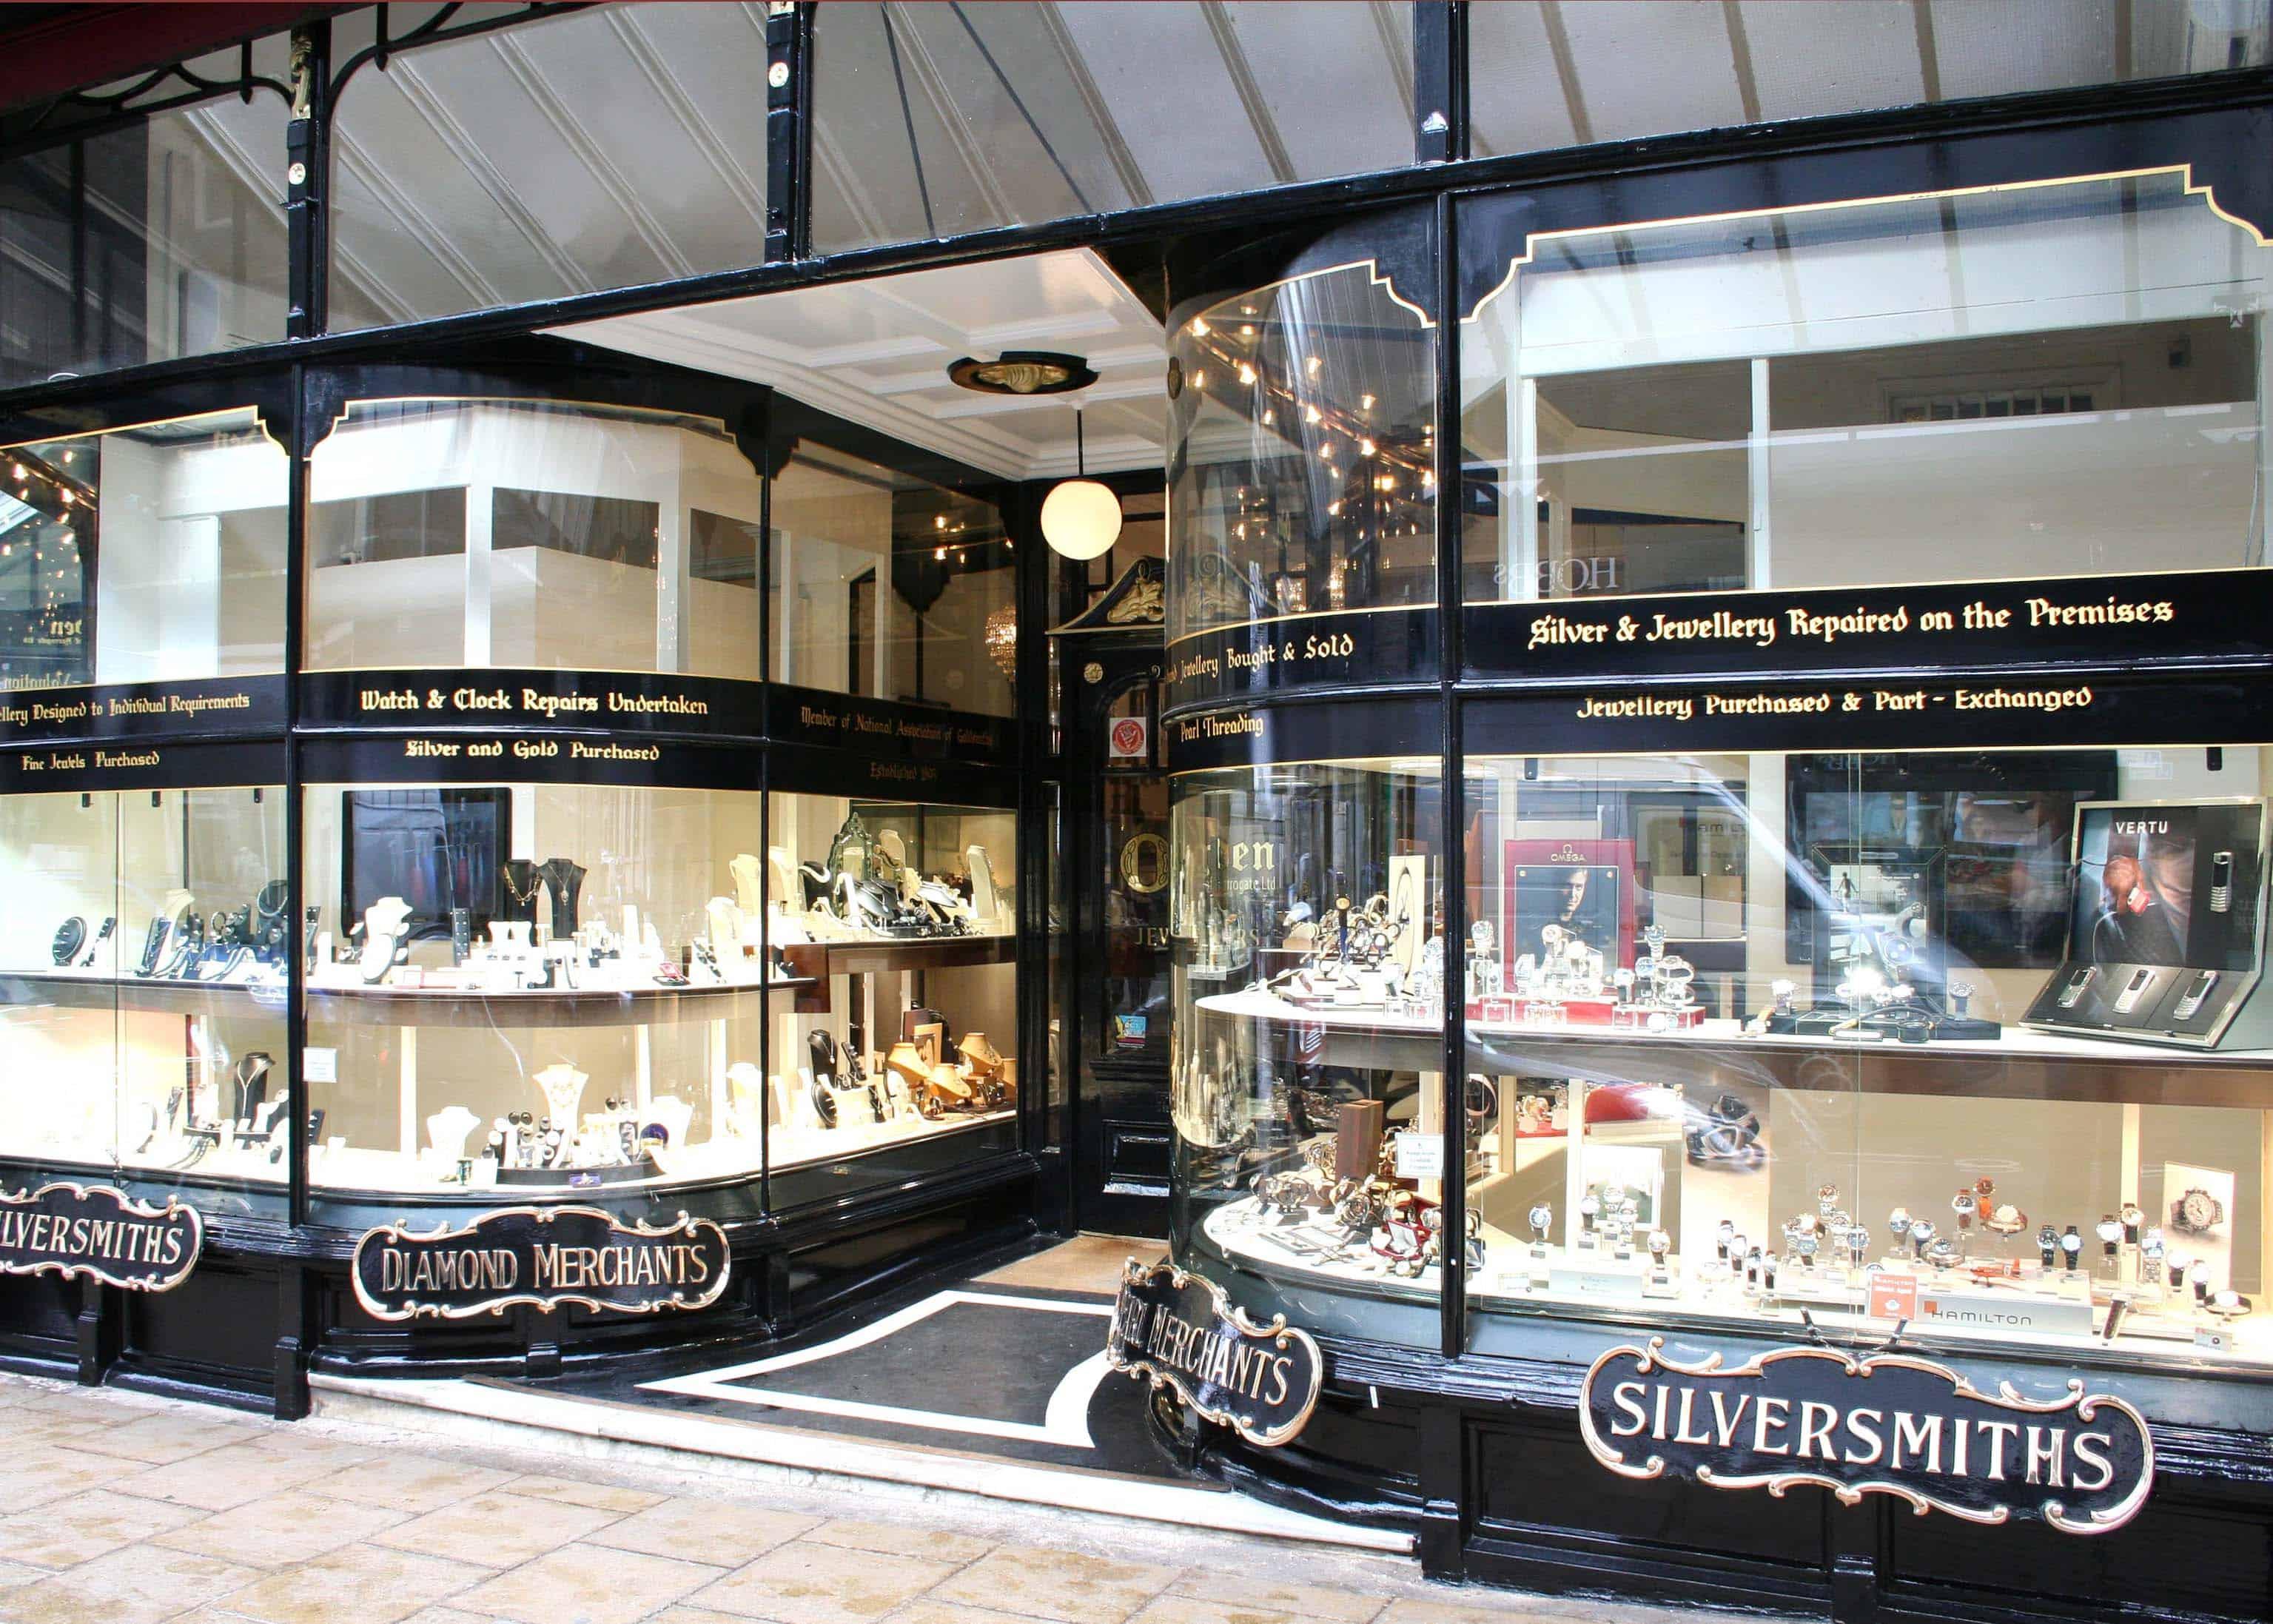 Gems, Diamonds and Jewellery Blogs, Jewellery News, Jewellery Trade Fair Reviews